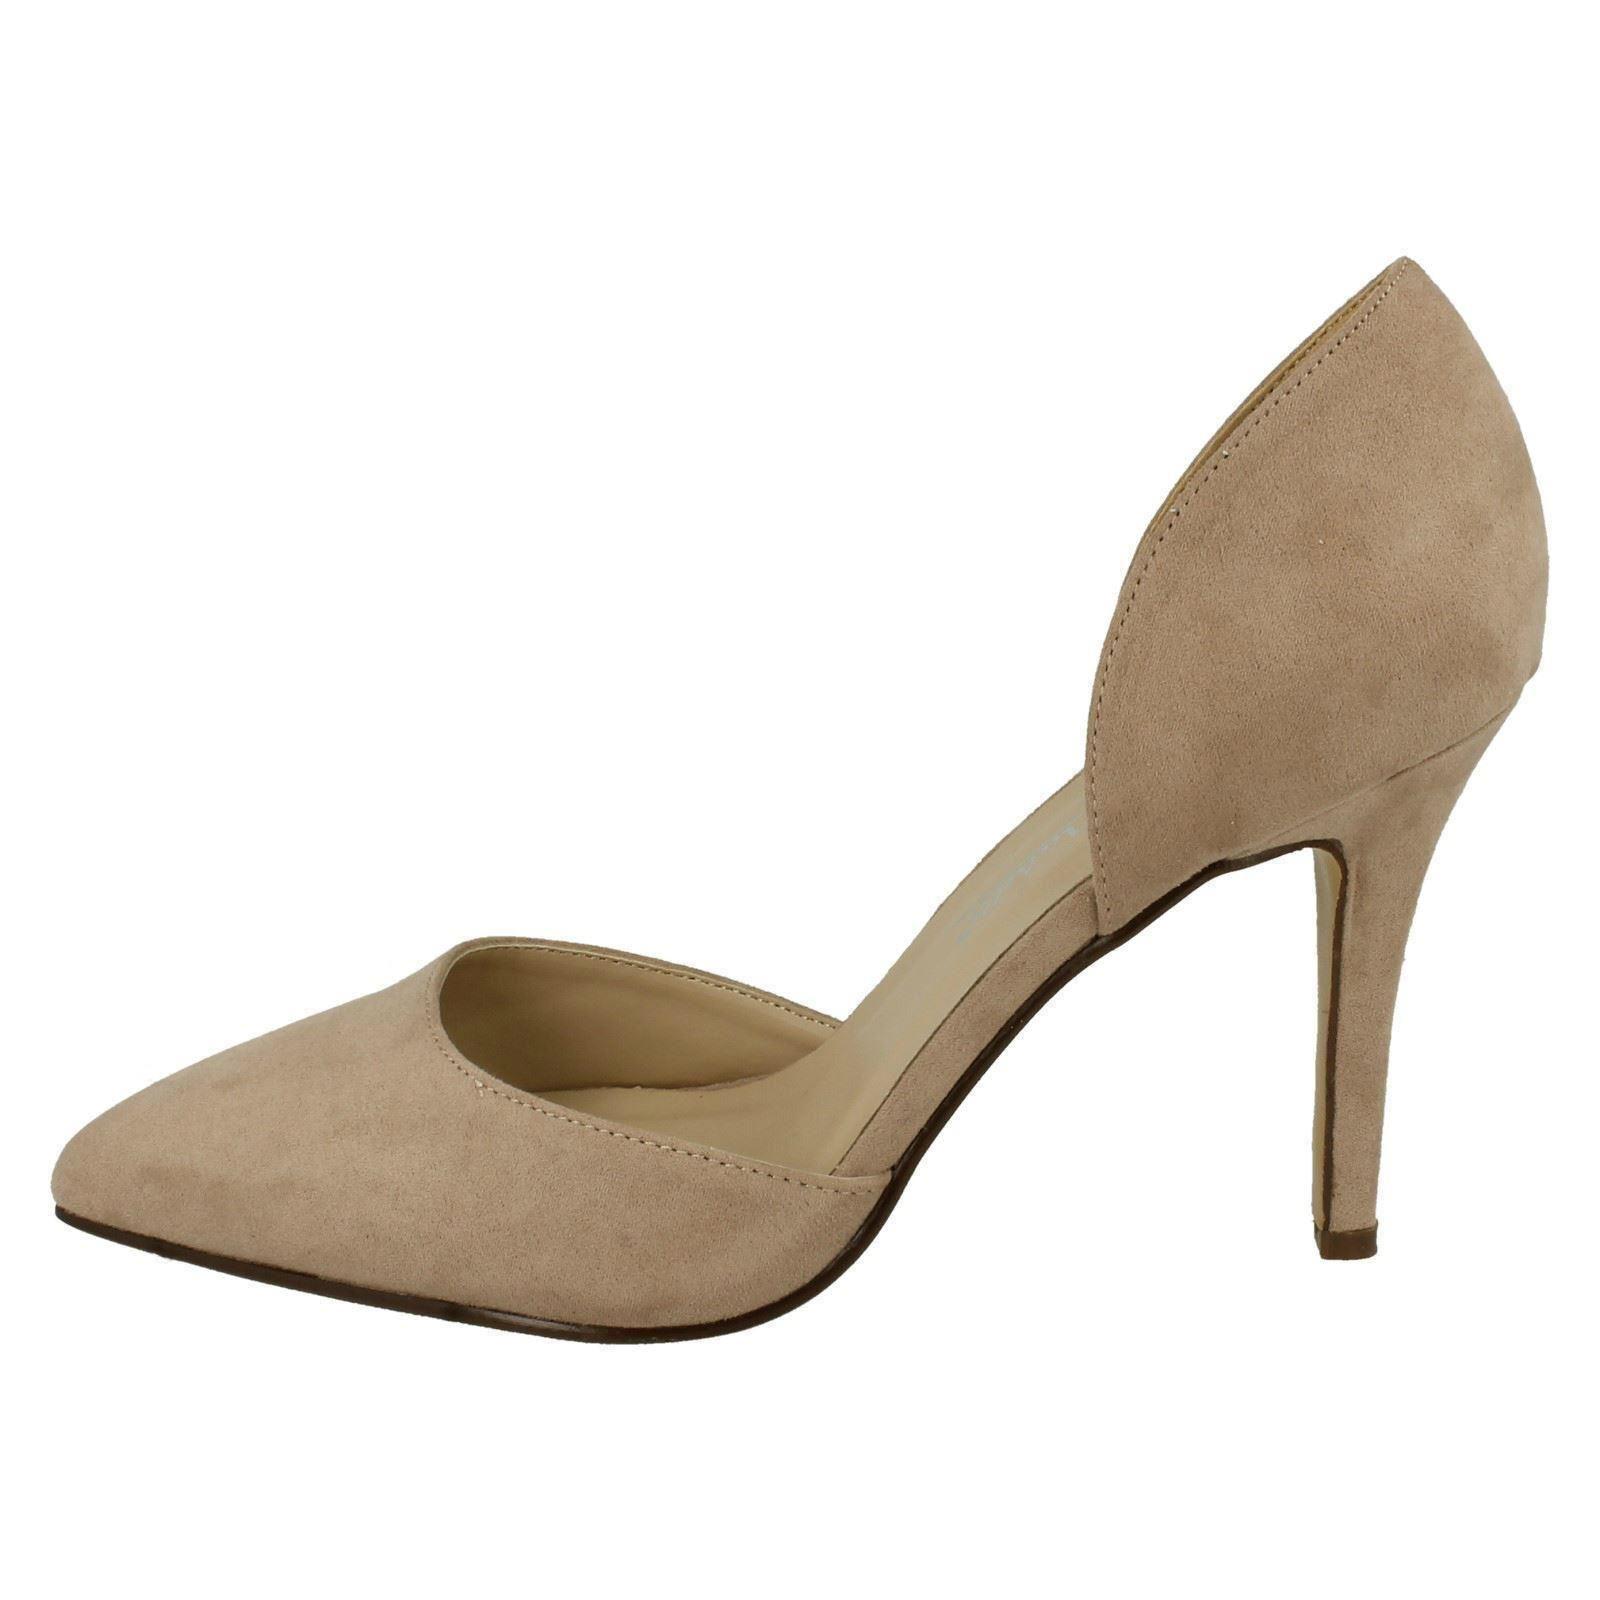 Anne Michelle Shoes F9914 Ladies Nude/Microfibre Court Shoes Michelle to 7 (R21A) afc835